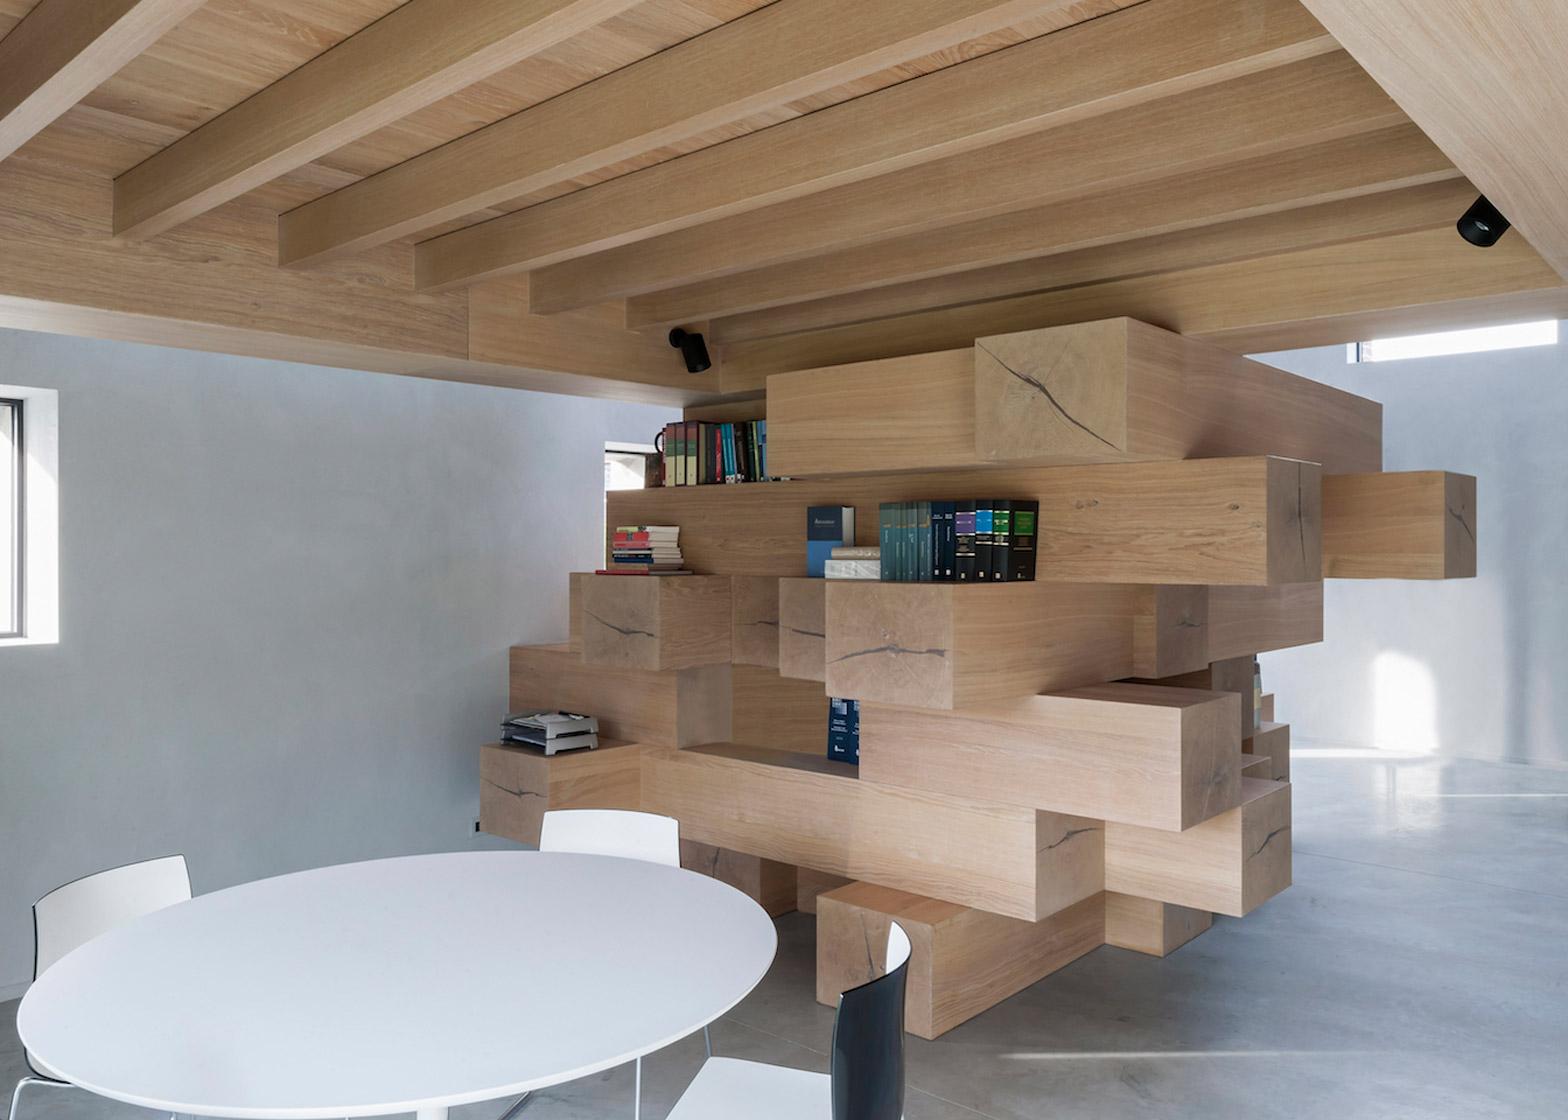 architecture_wood_office_design_studia_interiors_osnovadesign_osnova_poltava_02